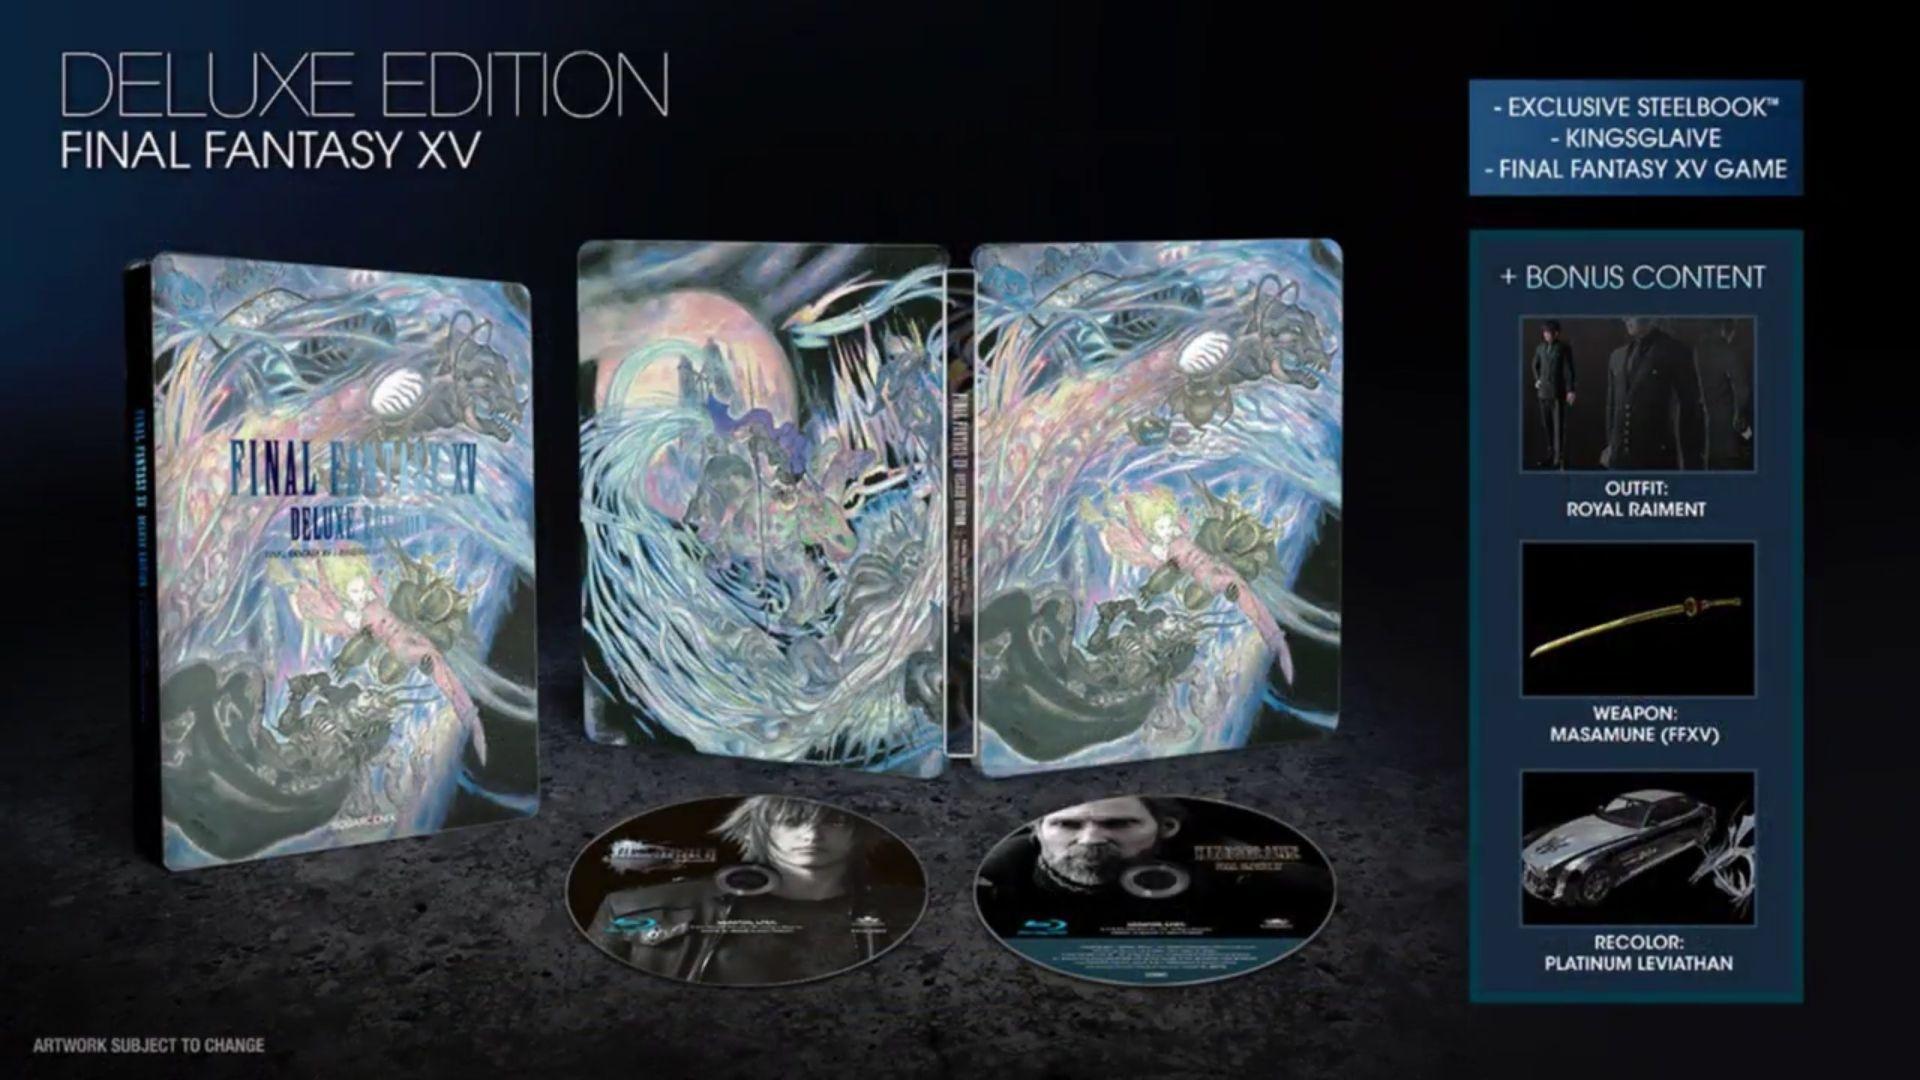 Final Fantasy XV - Deluxe edition